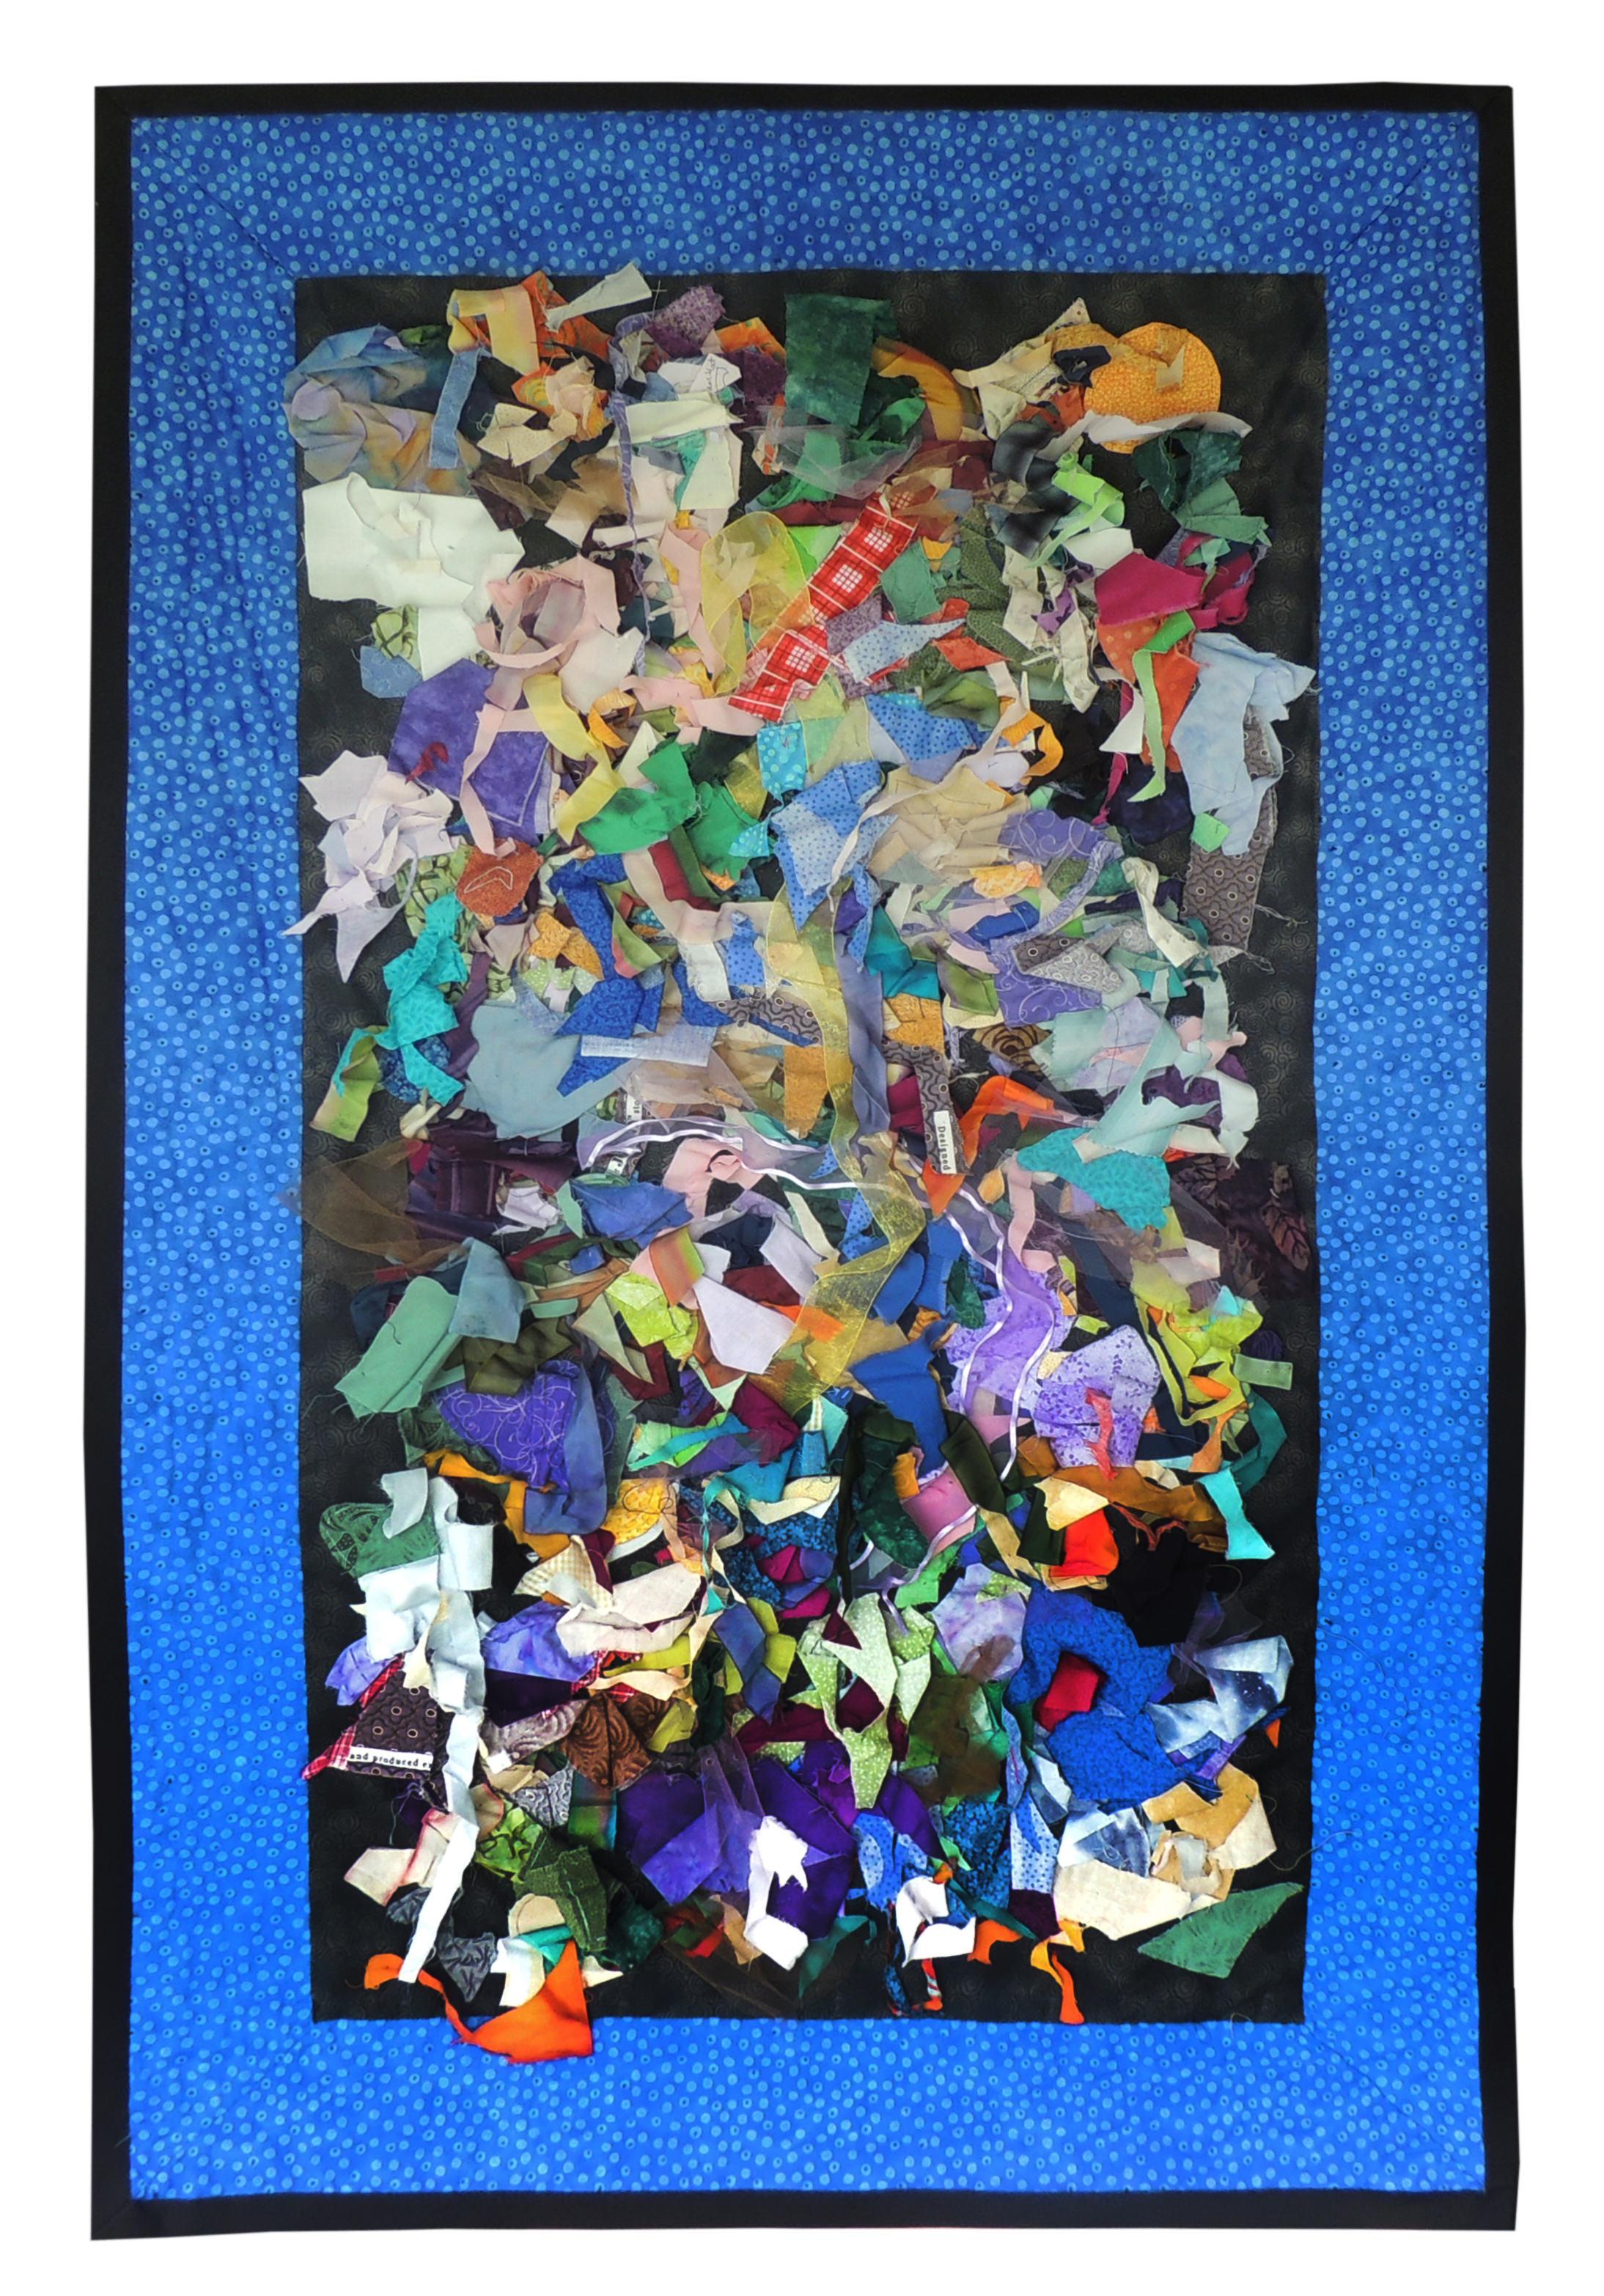 "Marianne Rabb Britton | JACKSON POLLOCK | Fabric & Embroidery | 51.5 x 32.5"" | Estate of Marianne Rabb Britton"